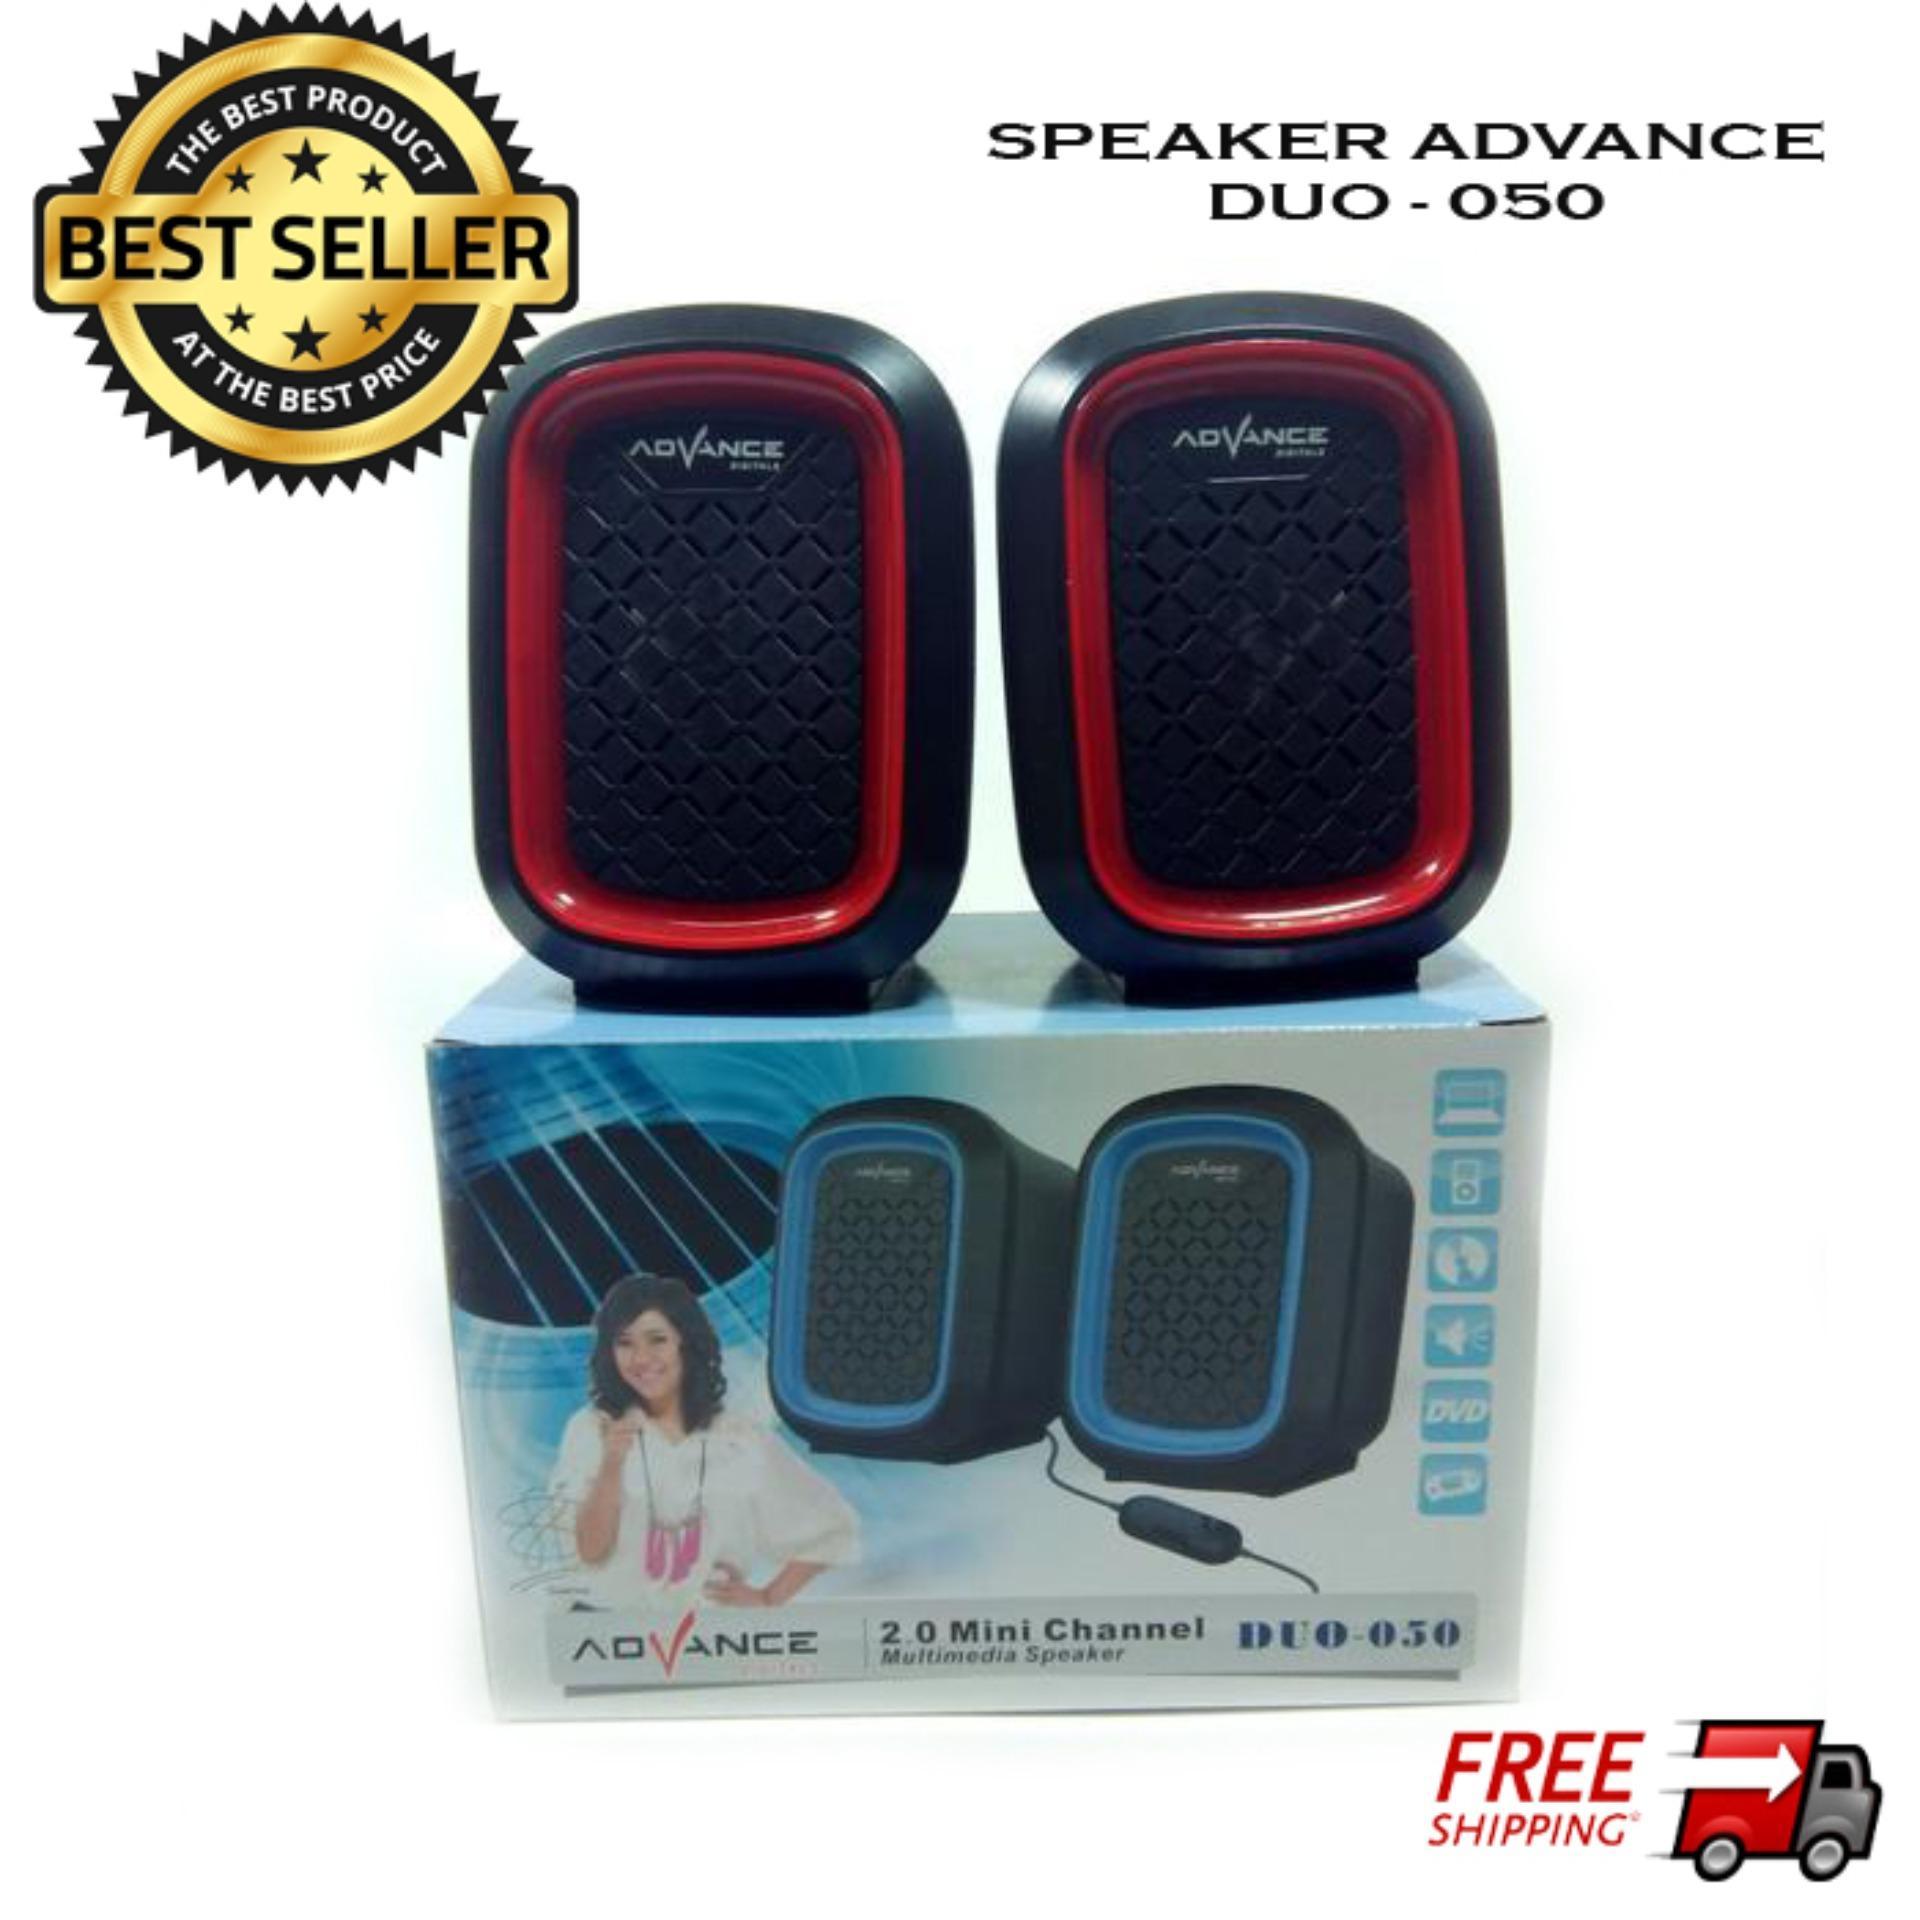 ... Review Advance Speaker Usb Duo 300 Hitam Biru Paling Mudah Source Advance